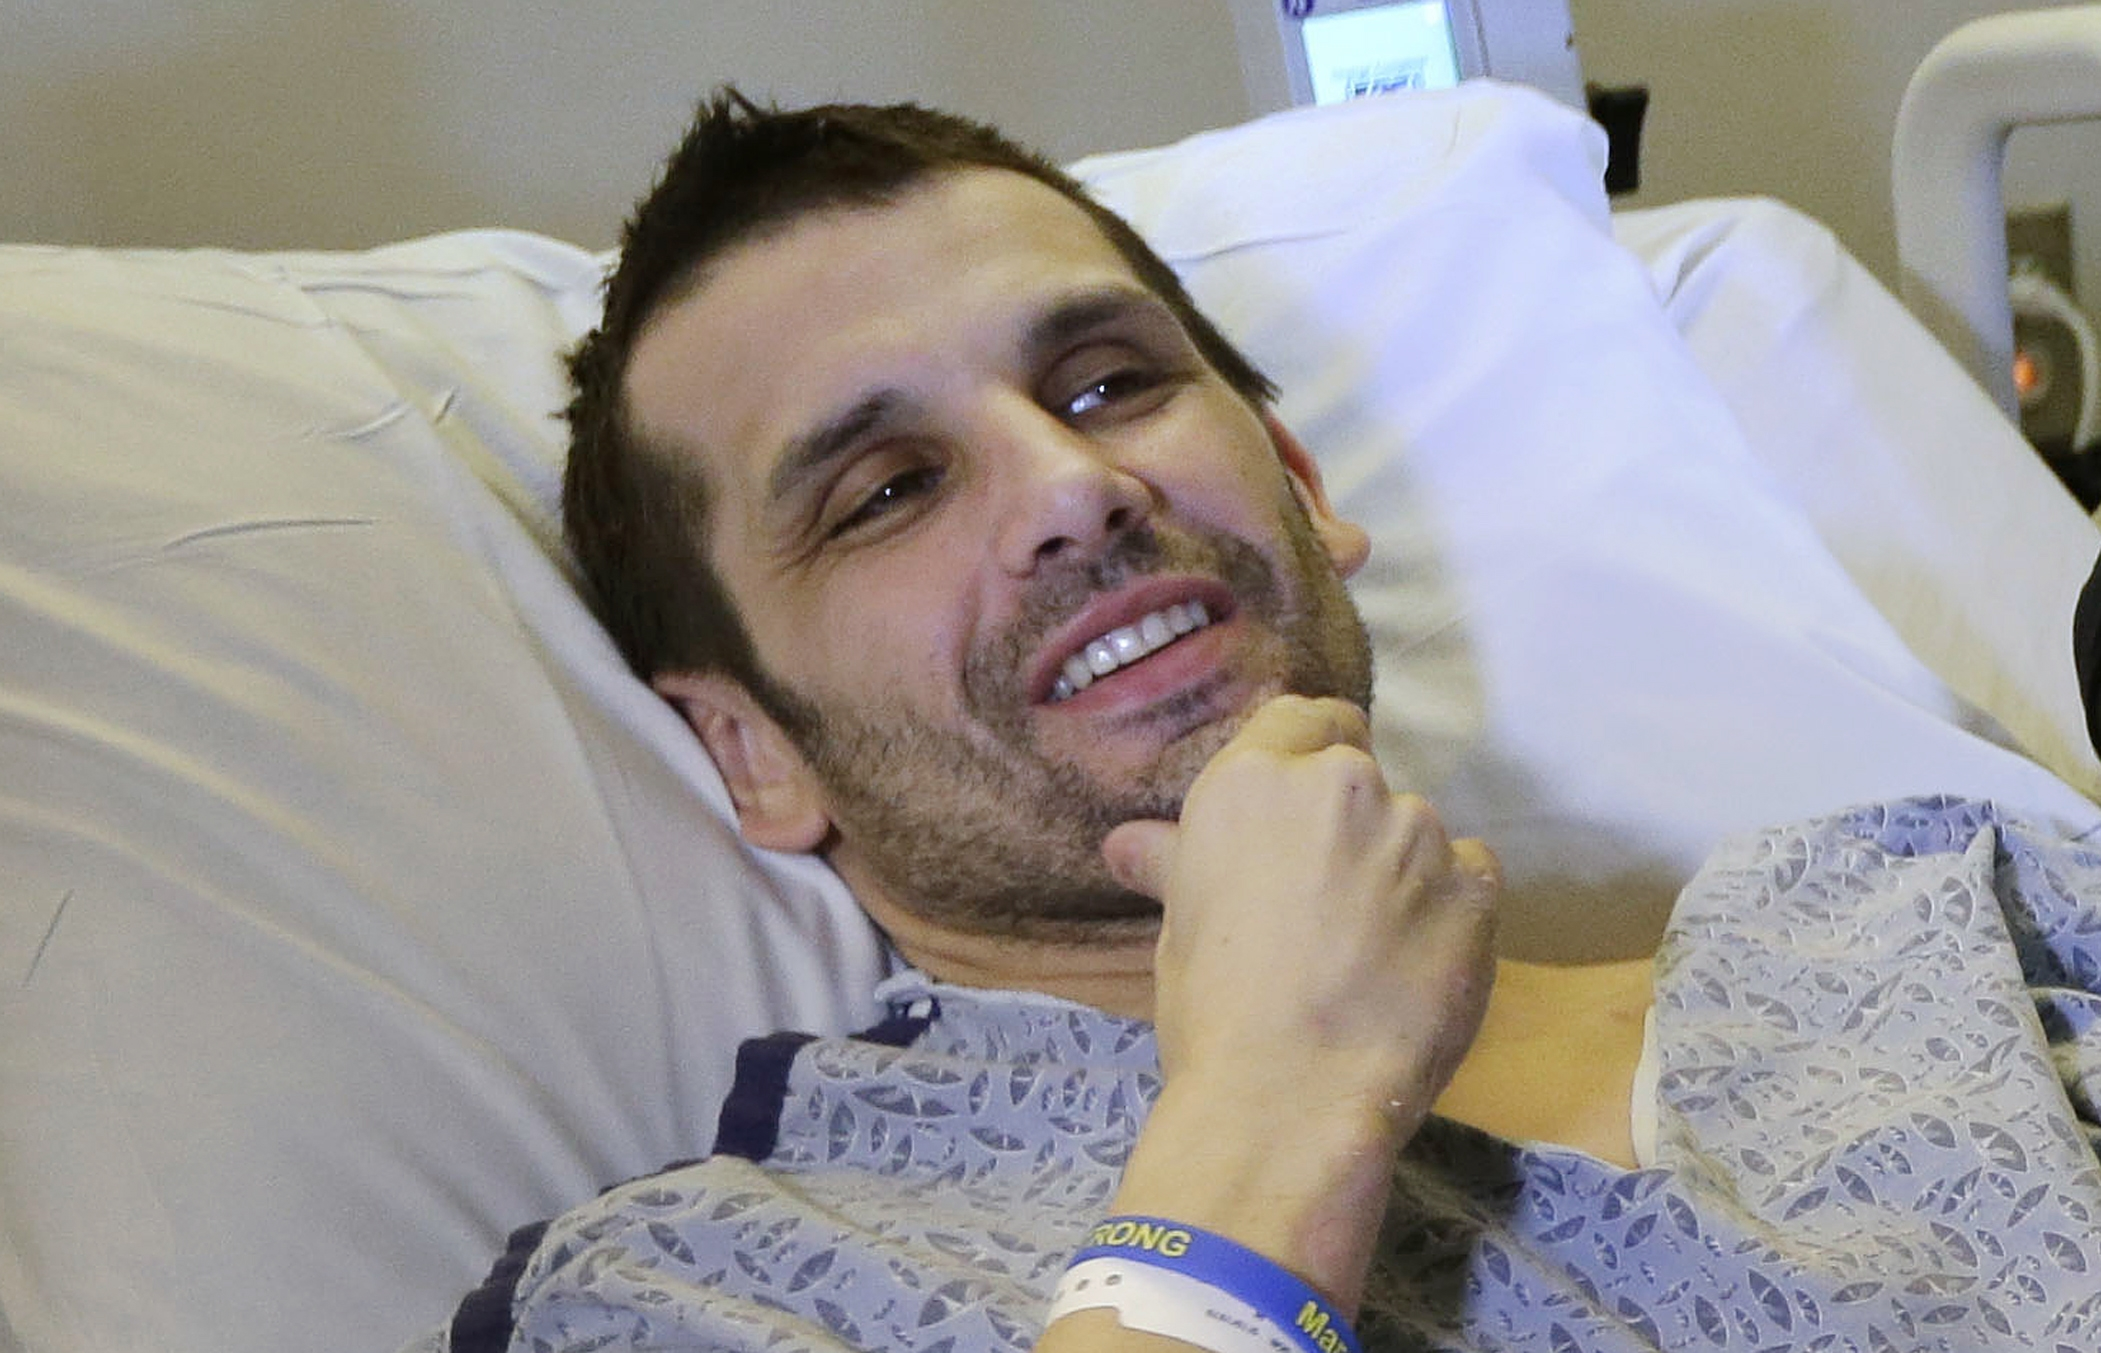 Wounded vets meet Boston Marathon bombing victims - CBS News